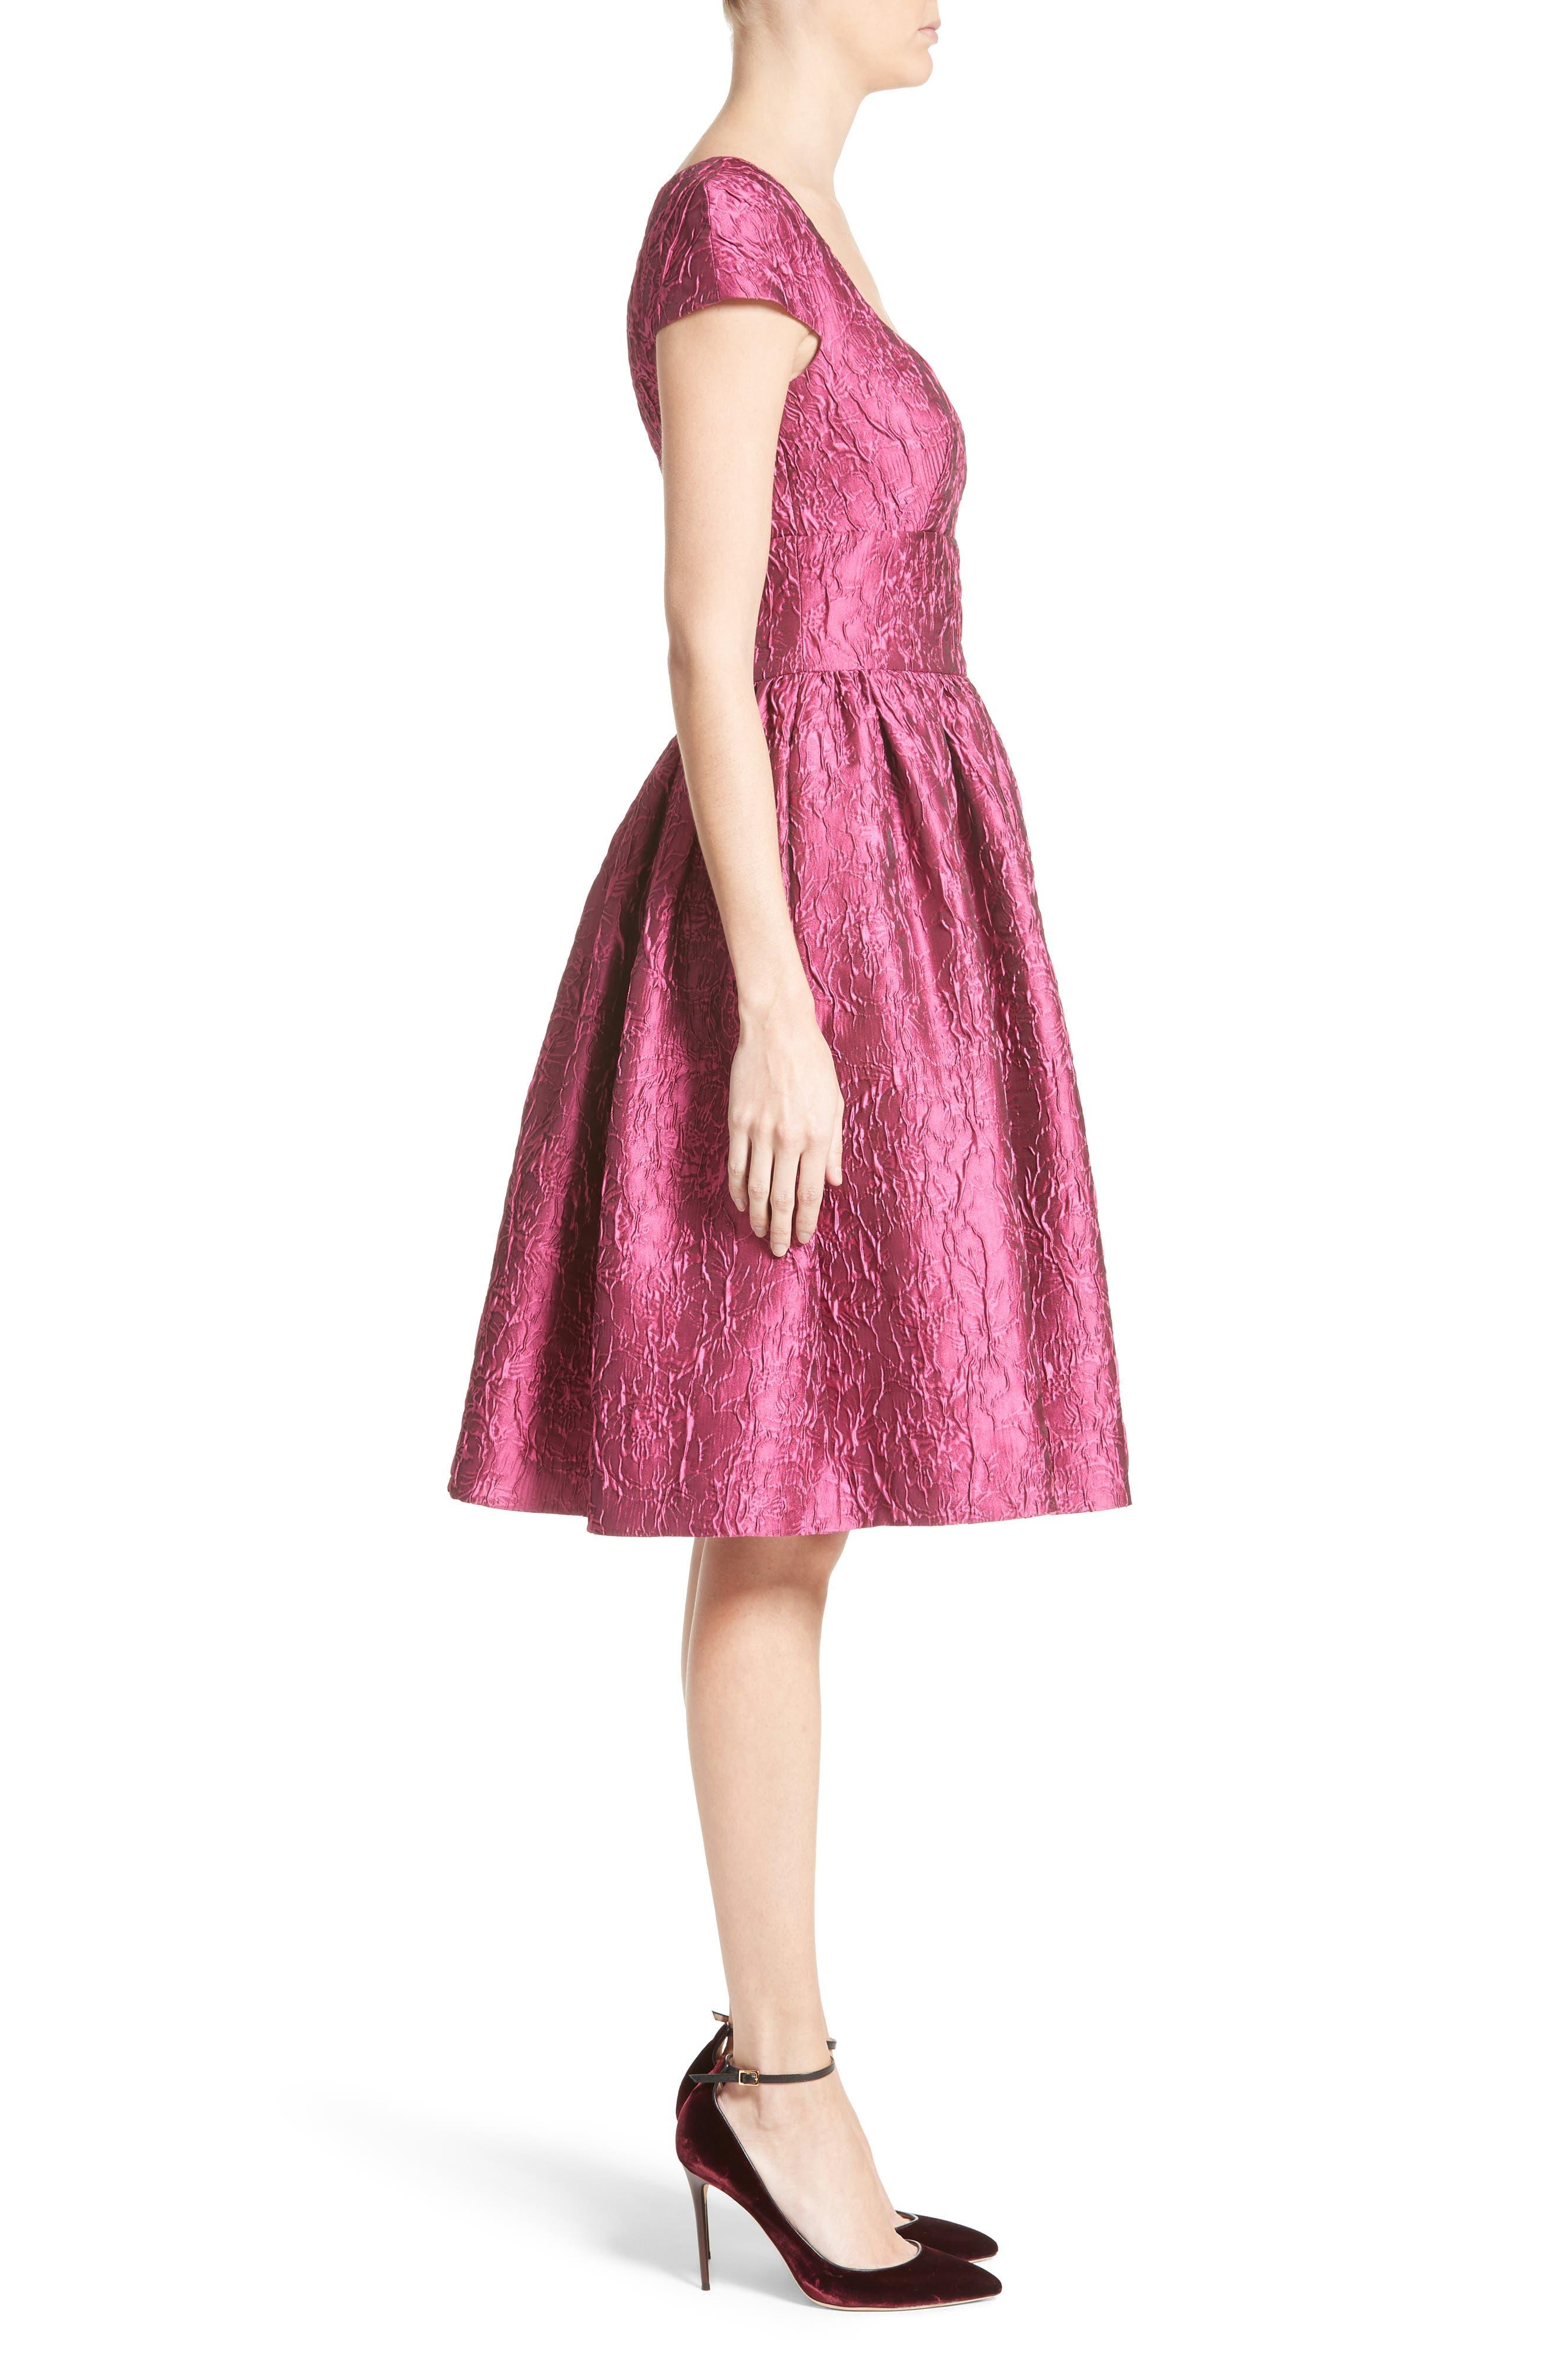 BADGLEY MISCHKA COUTURE., Badgley Mischka Couture Cap Sleeve Brocade Party Dress, Alternate thumbnail 4, color, 652